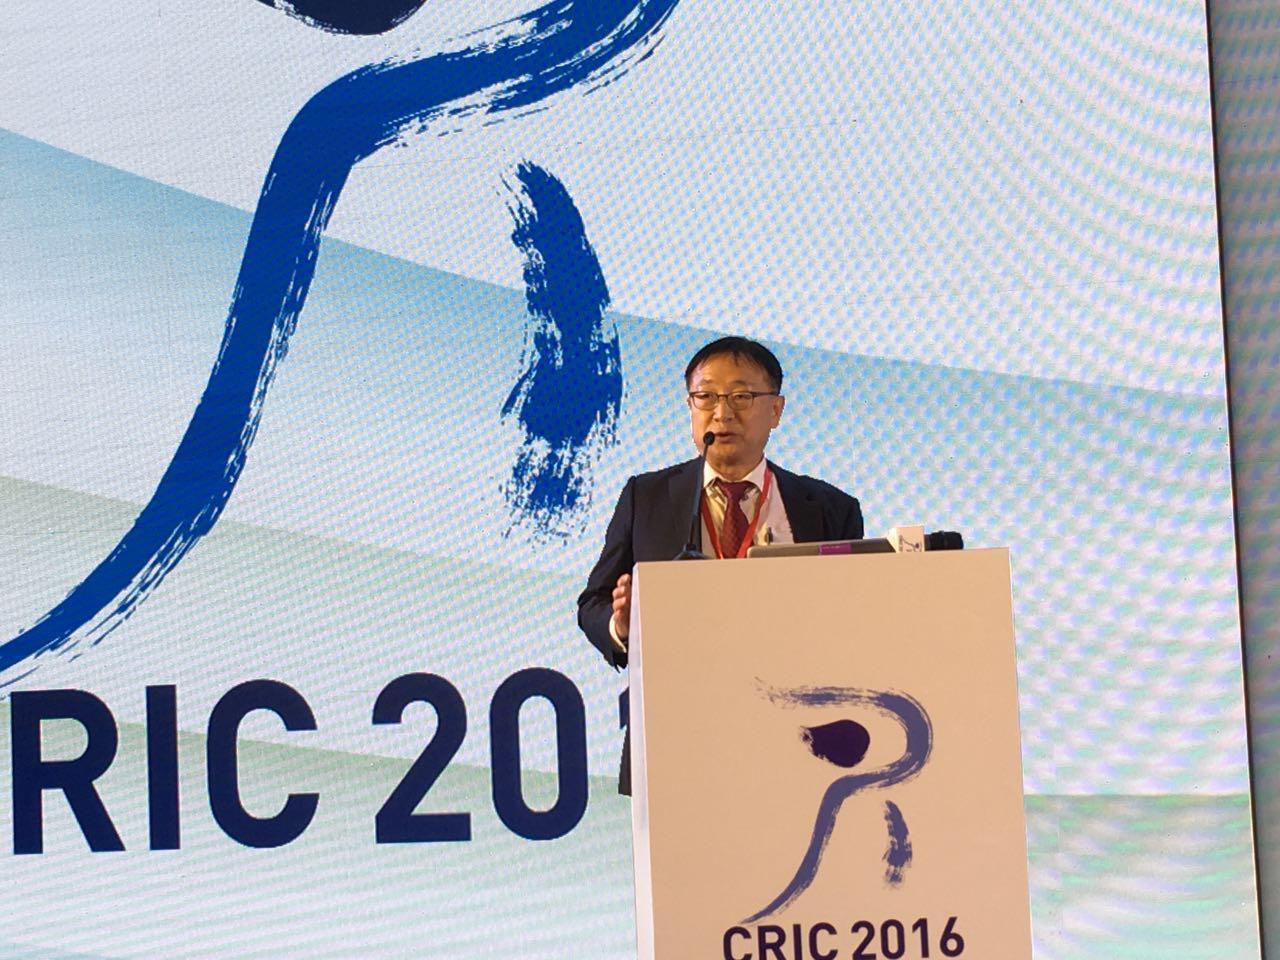 Jong-oh Park:机器人将占领世界 2016年到2029年全球工业机器人销售量或达140万台